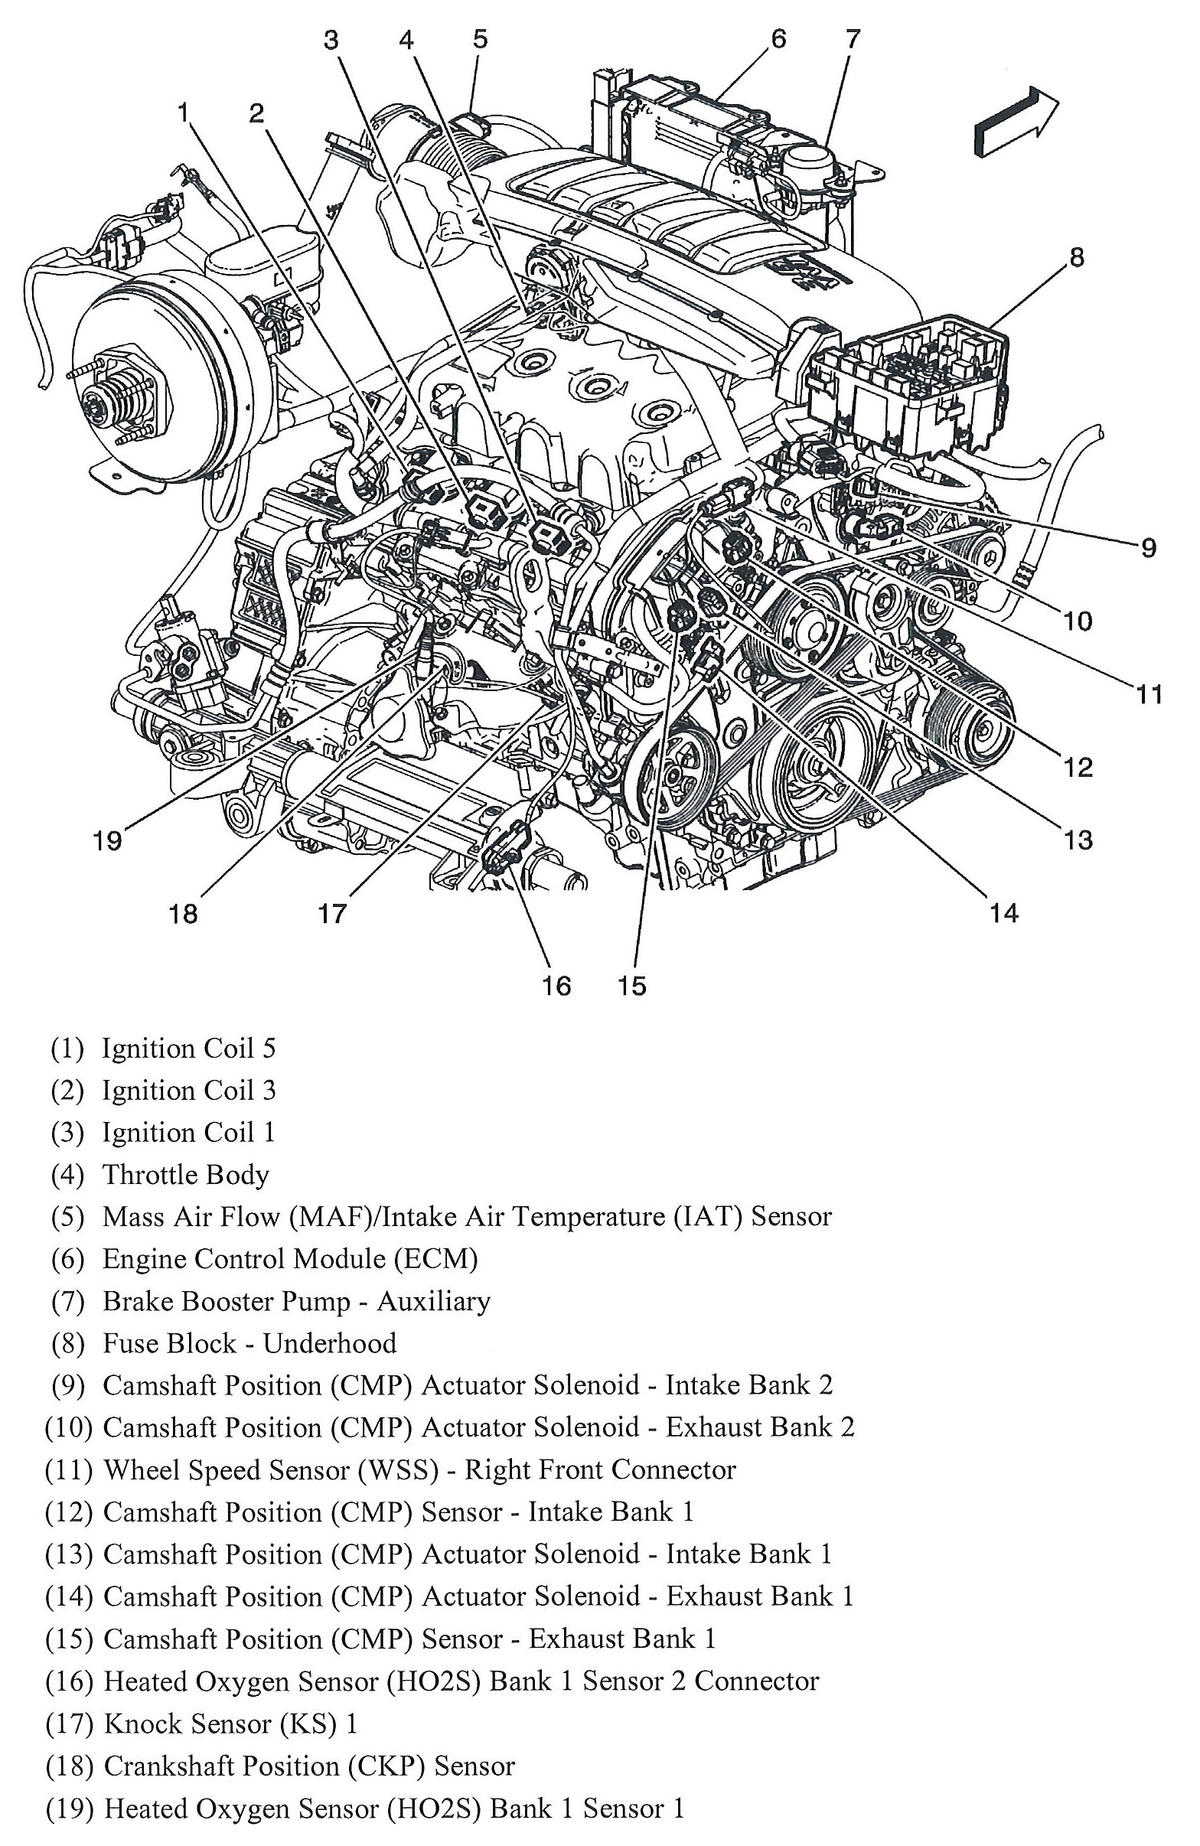 Acadia Engine Diagram - wiring diagrams schematicswiring diagrams schematics - vanriet-advocaten.nl